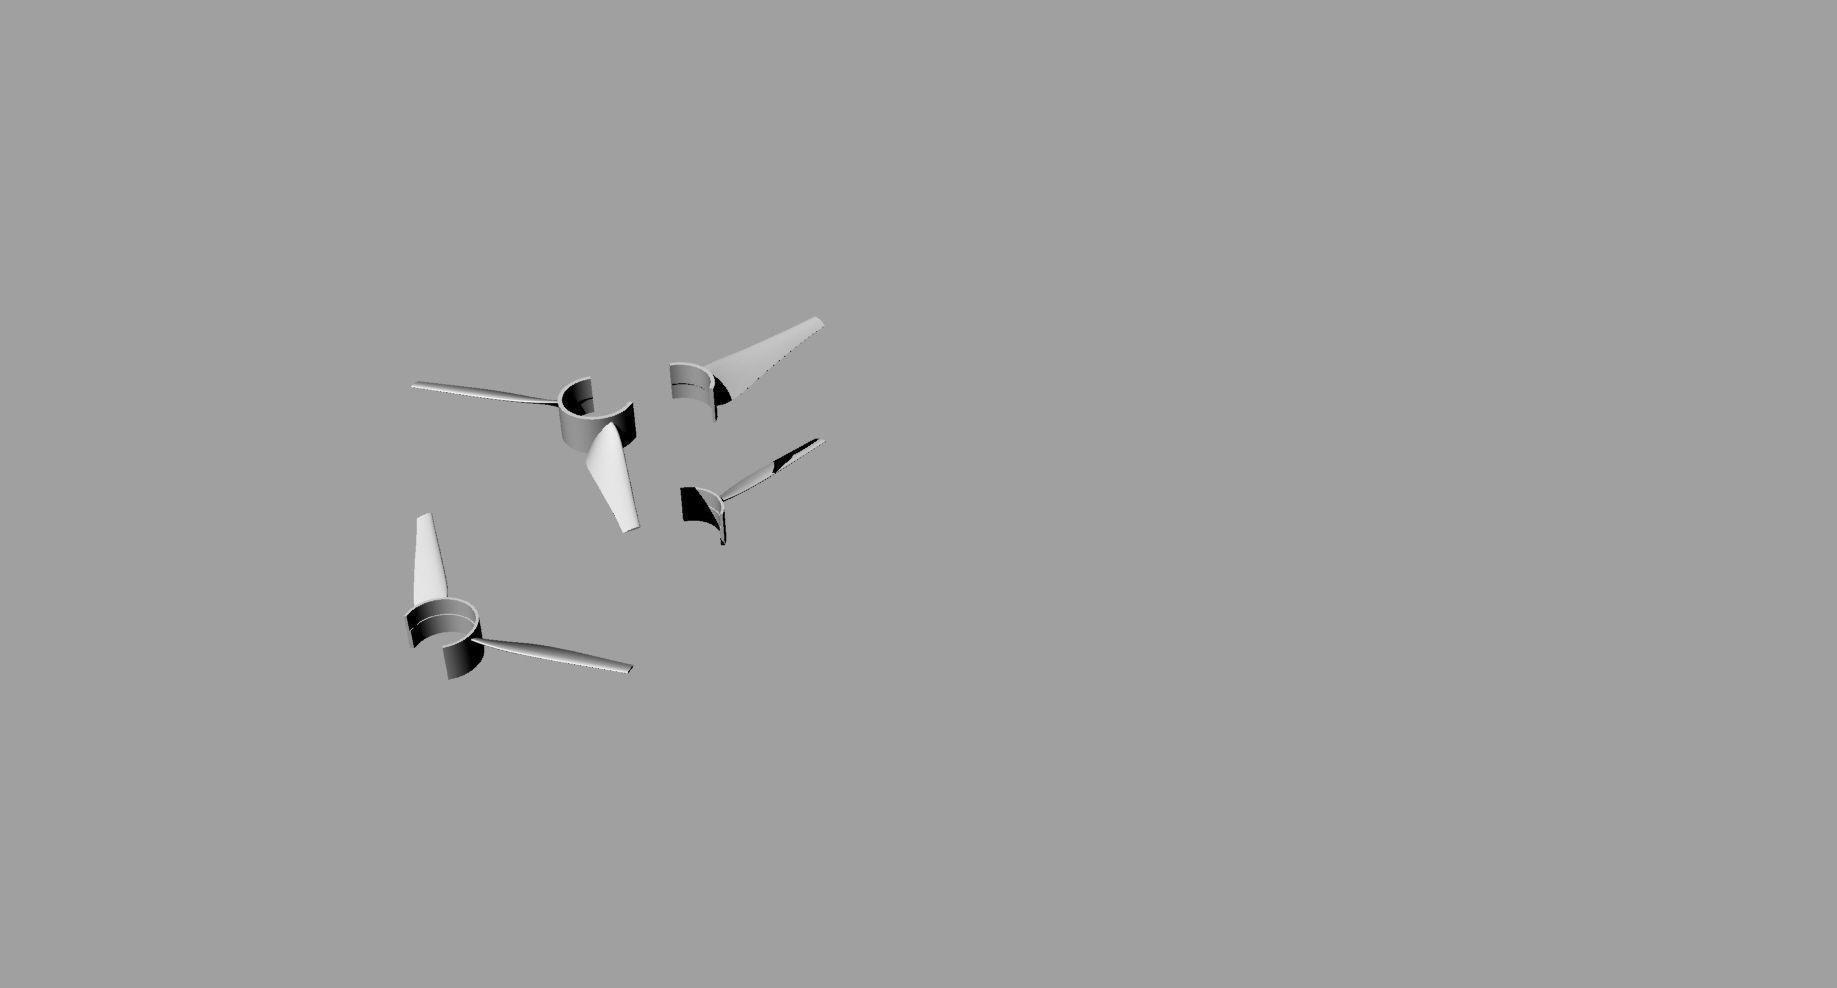 Propeller counter rotating in segments - diameter 560 mm